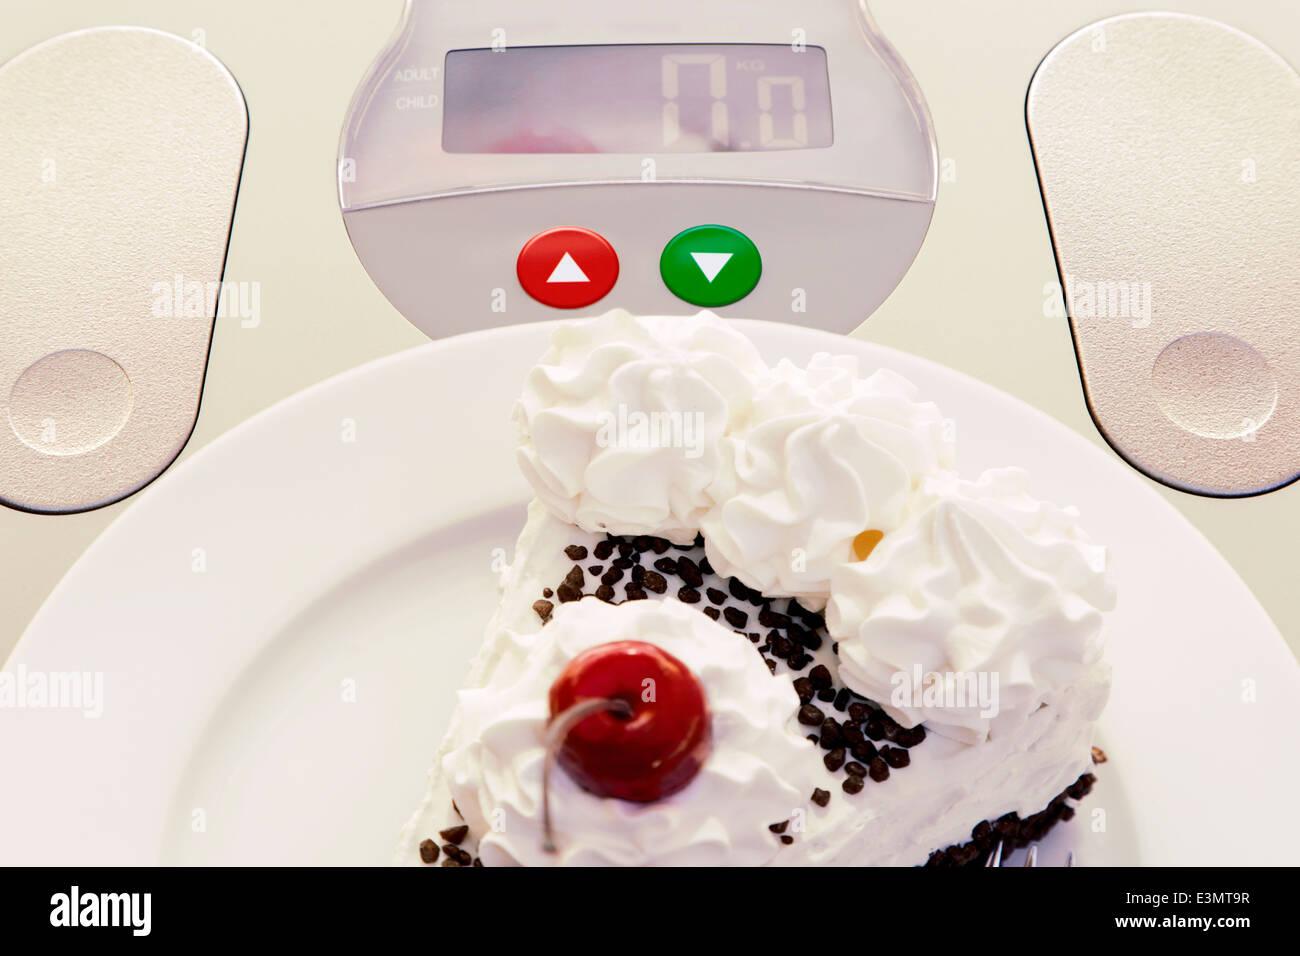 Cake on bathroom scale symbolizes overweight - Stock Image